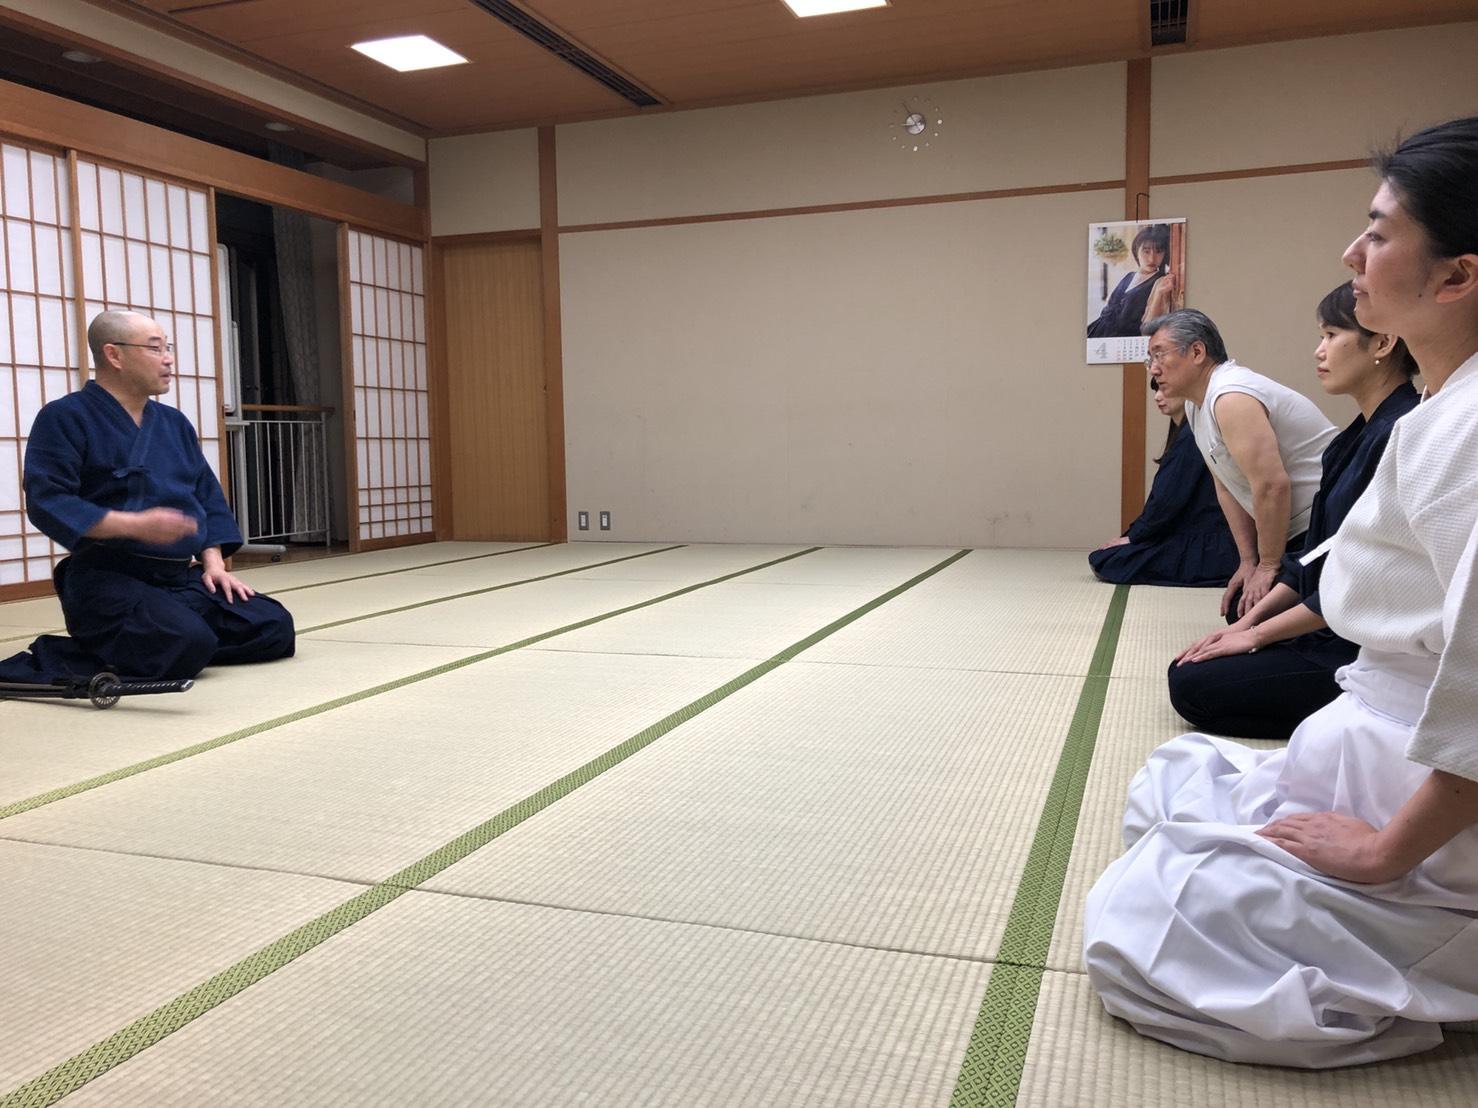 S  84181021 - 釈正輪老師、武道礼法&呼吸法開催